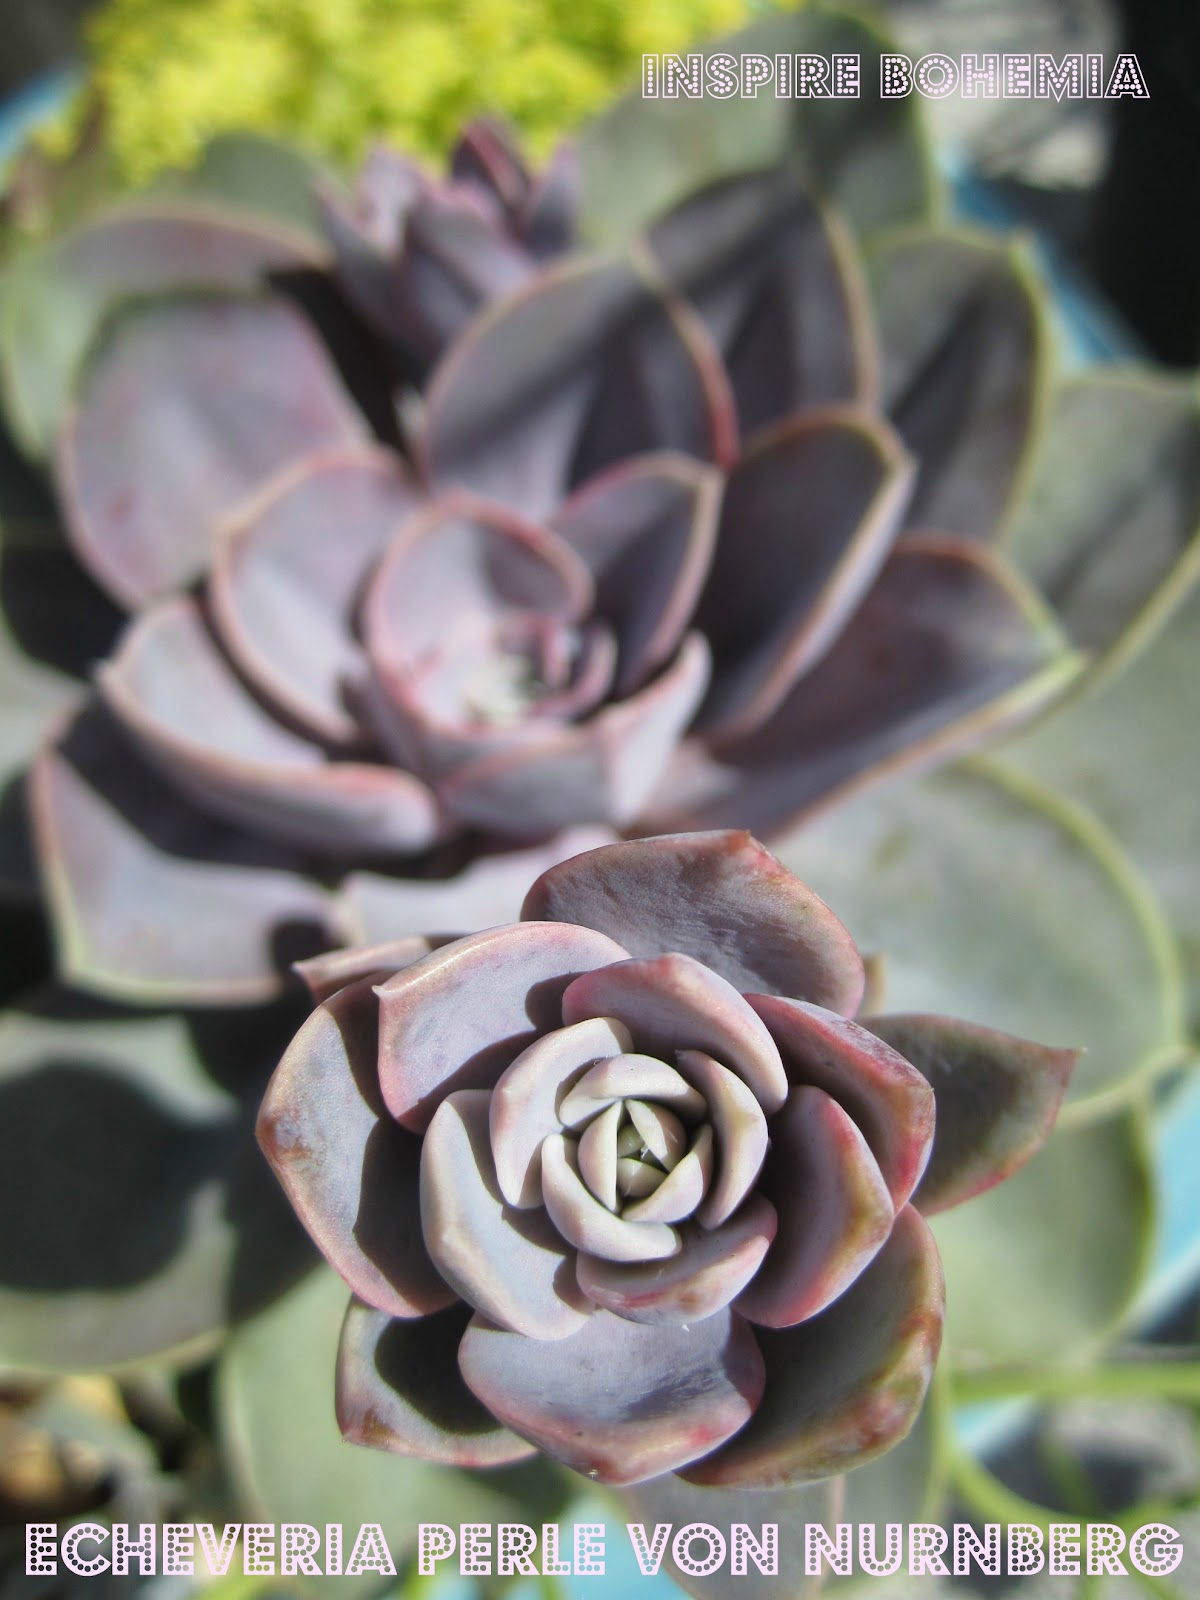 www.InspireBohemia.com - succulent planter - Echeveria Perle von Nurnberg - gardening - how-to - tip